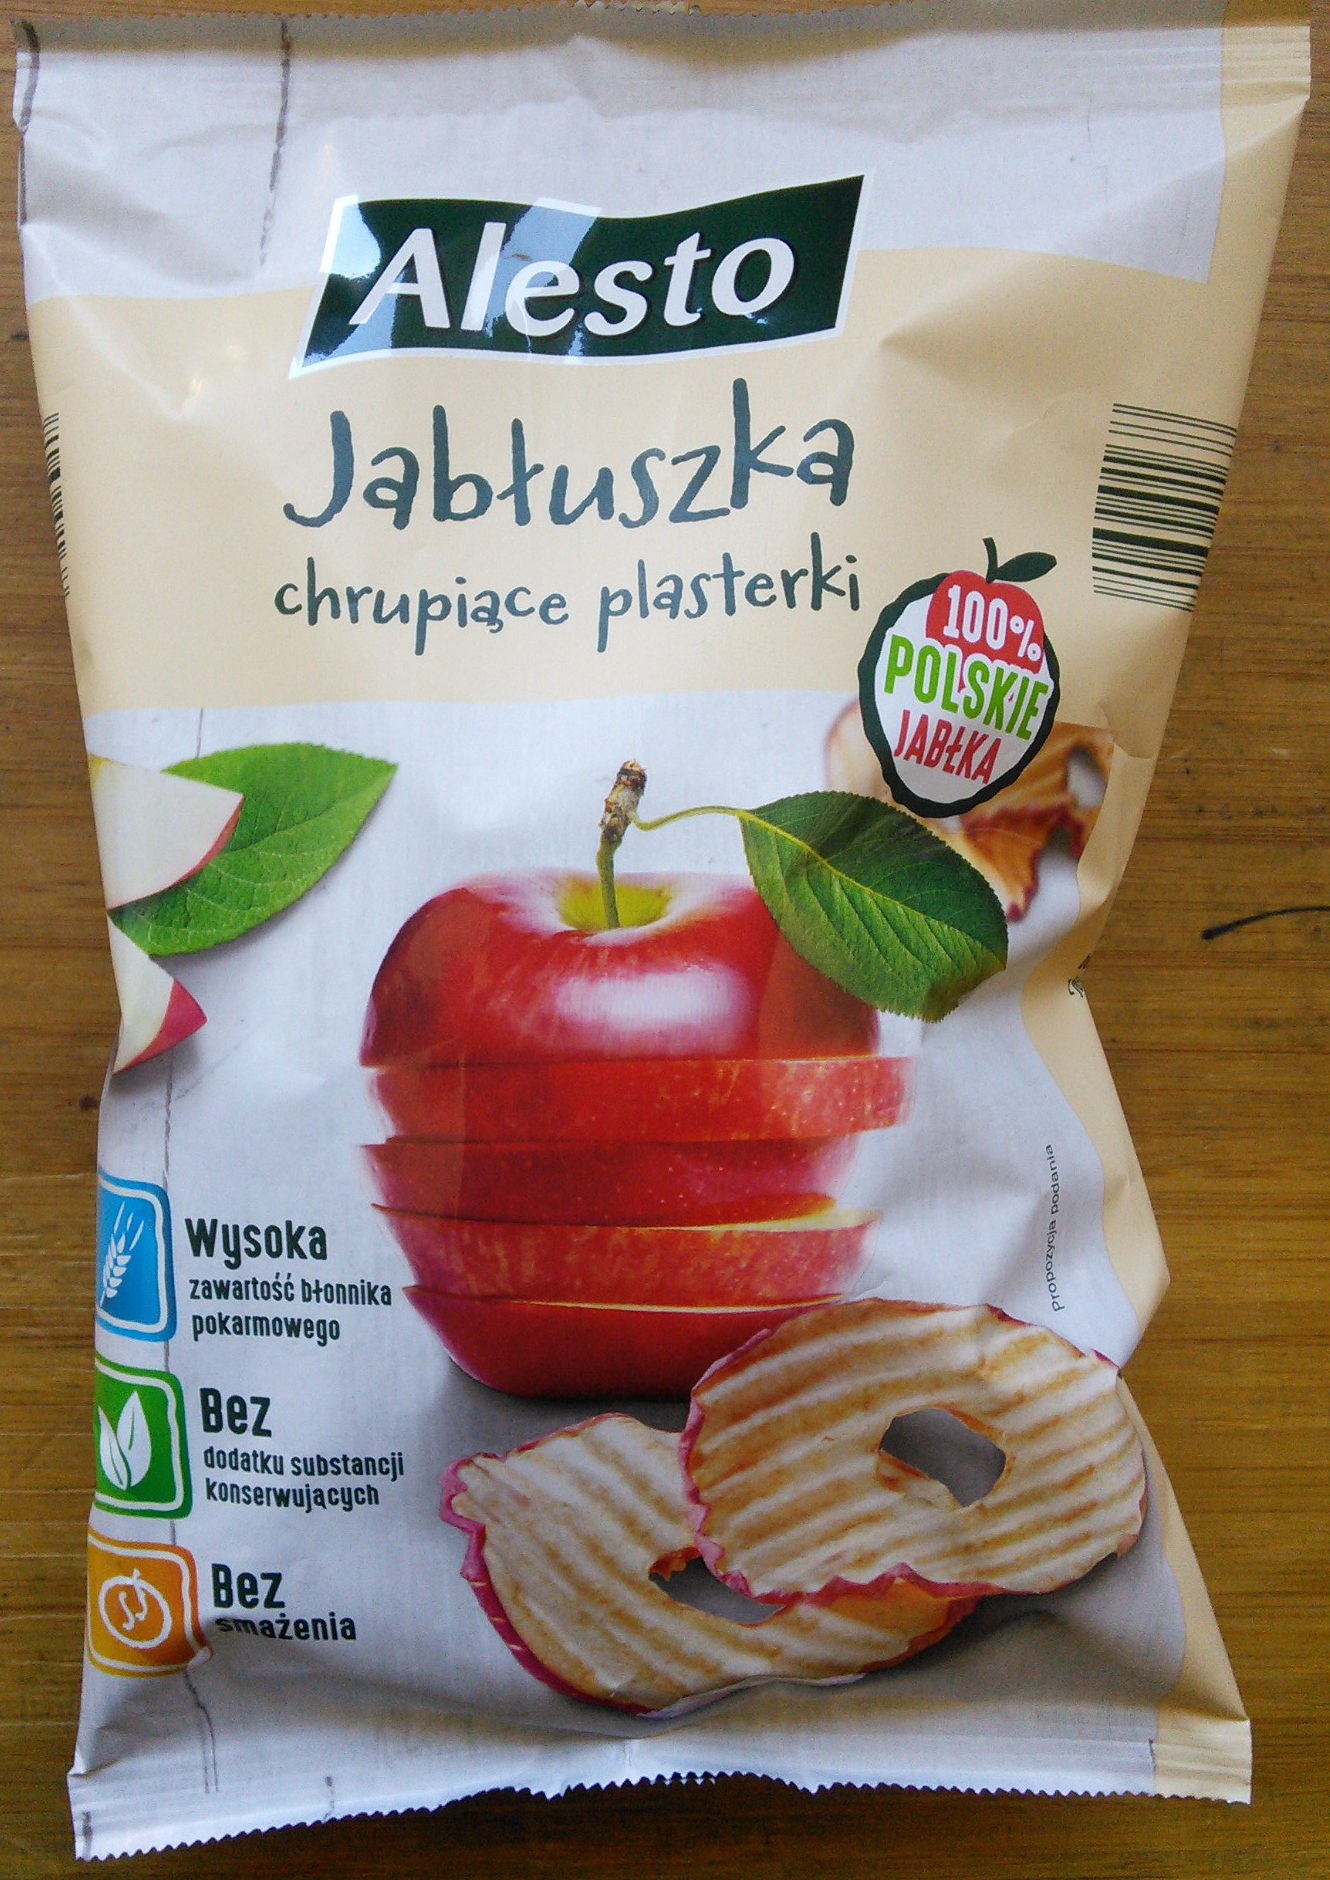 Alesto Jabłuszka Chrupiące plasterki - Product - pl